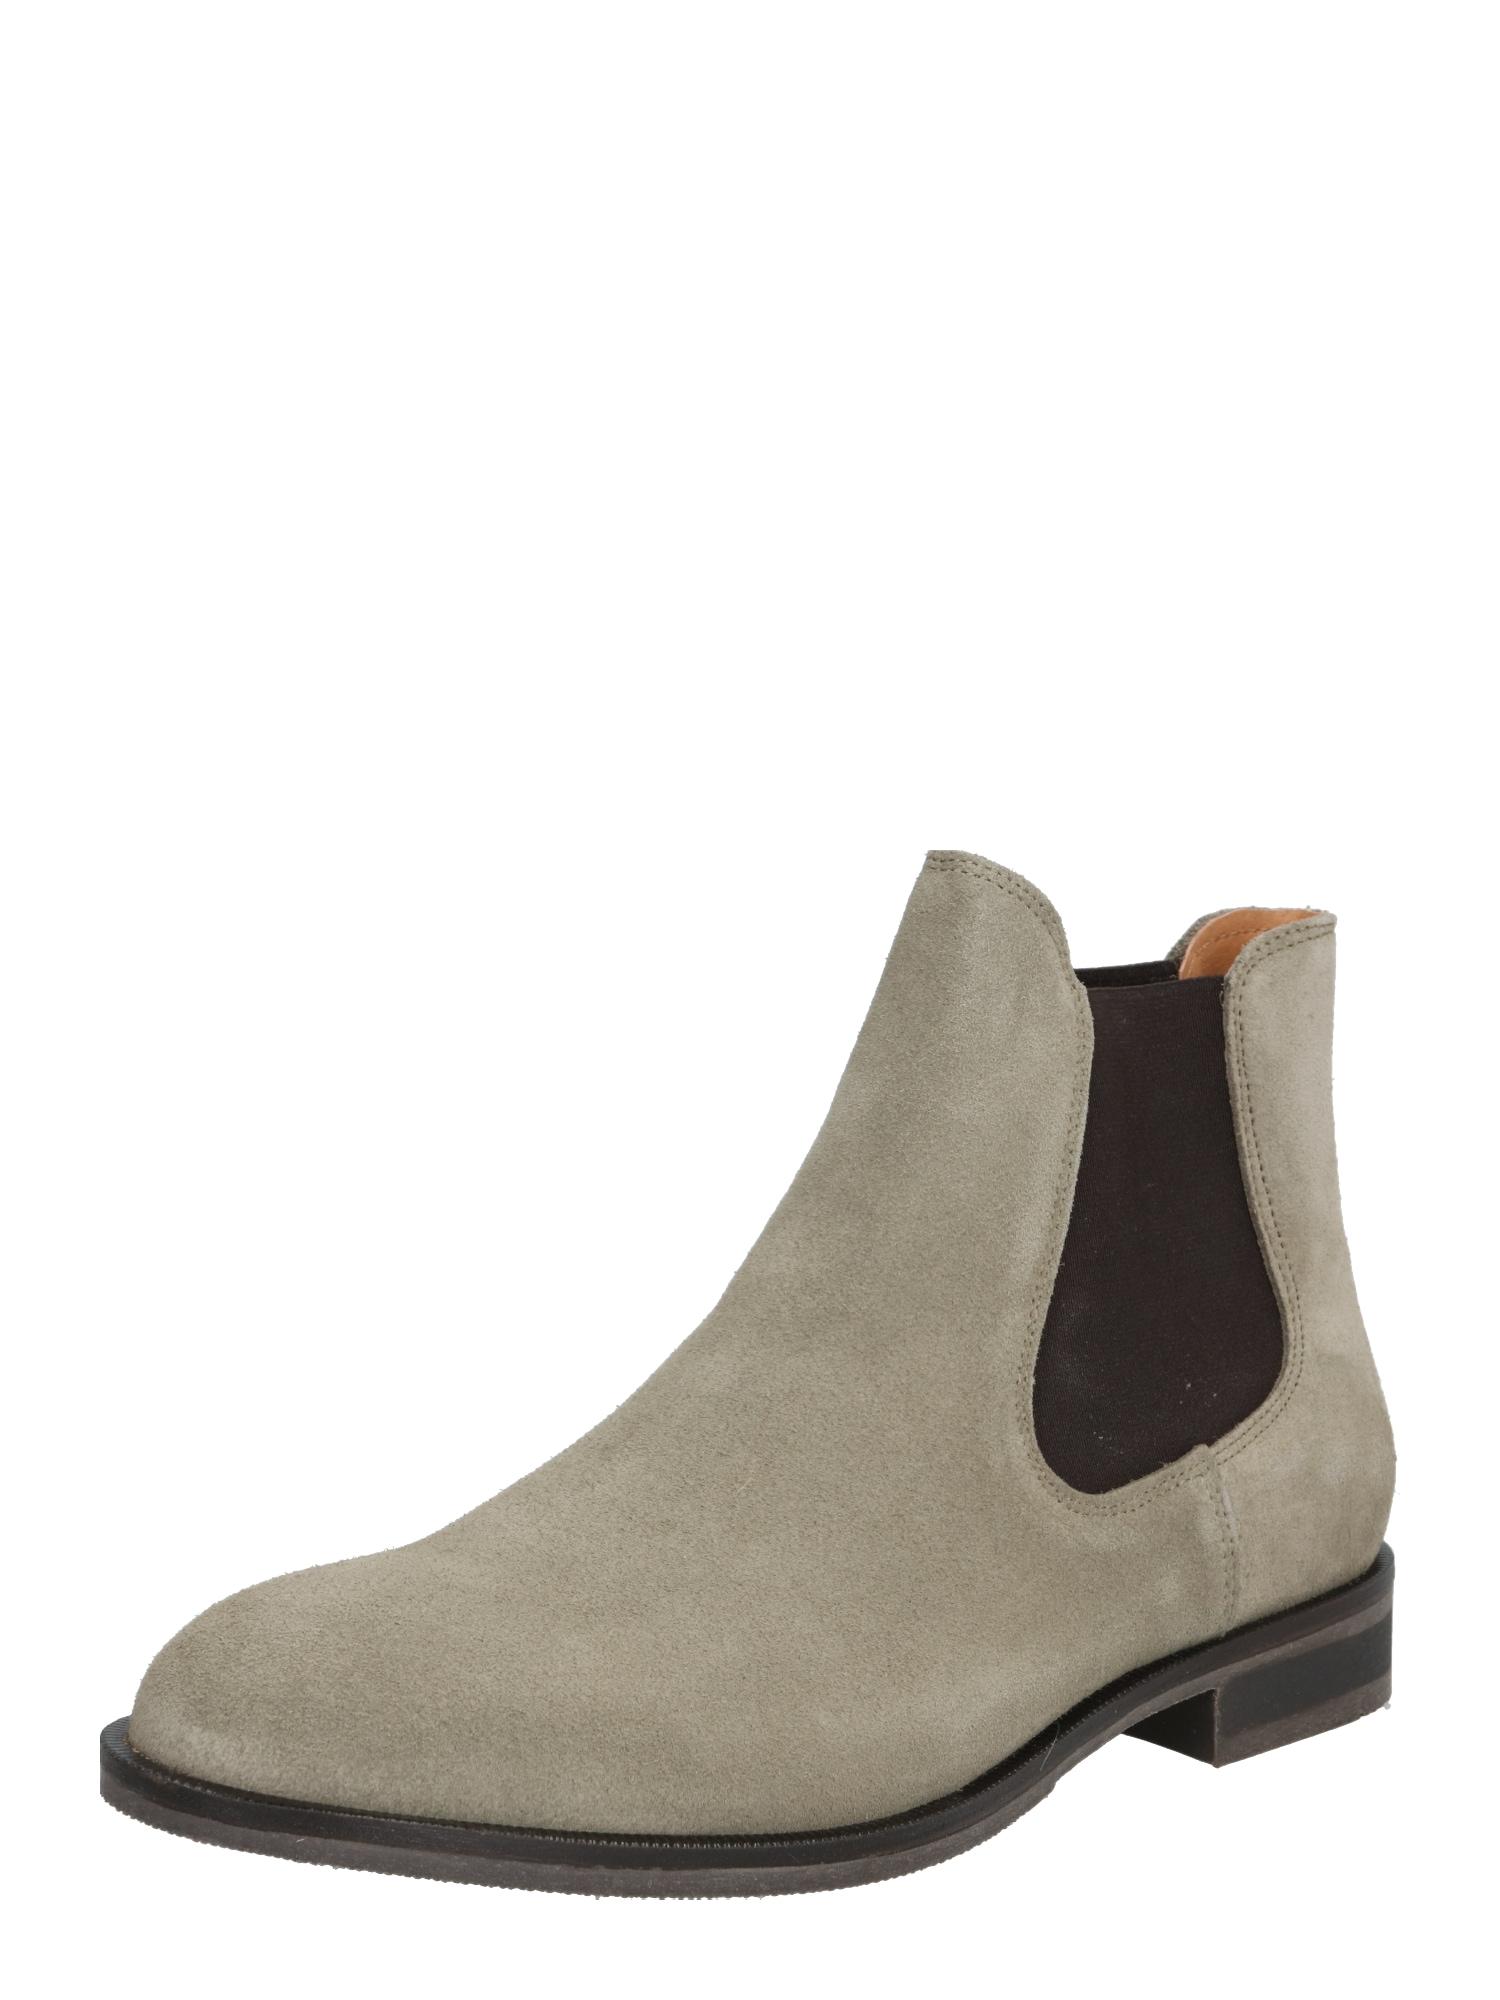 SELECTED HOMME Chelsea batai smėlio / ruda